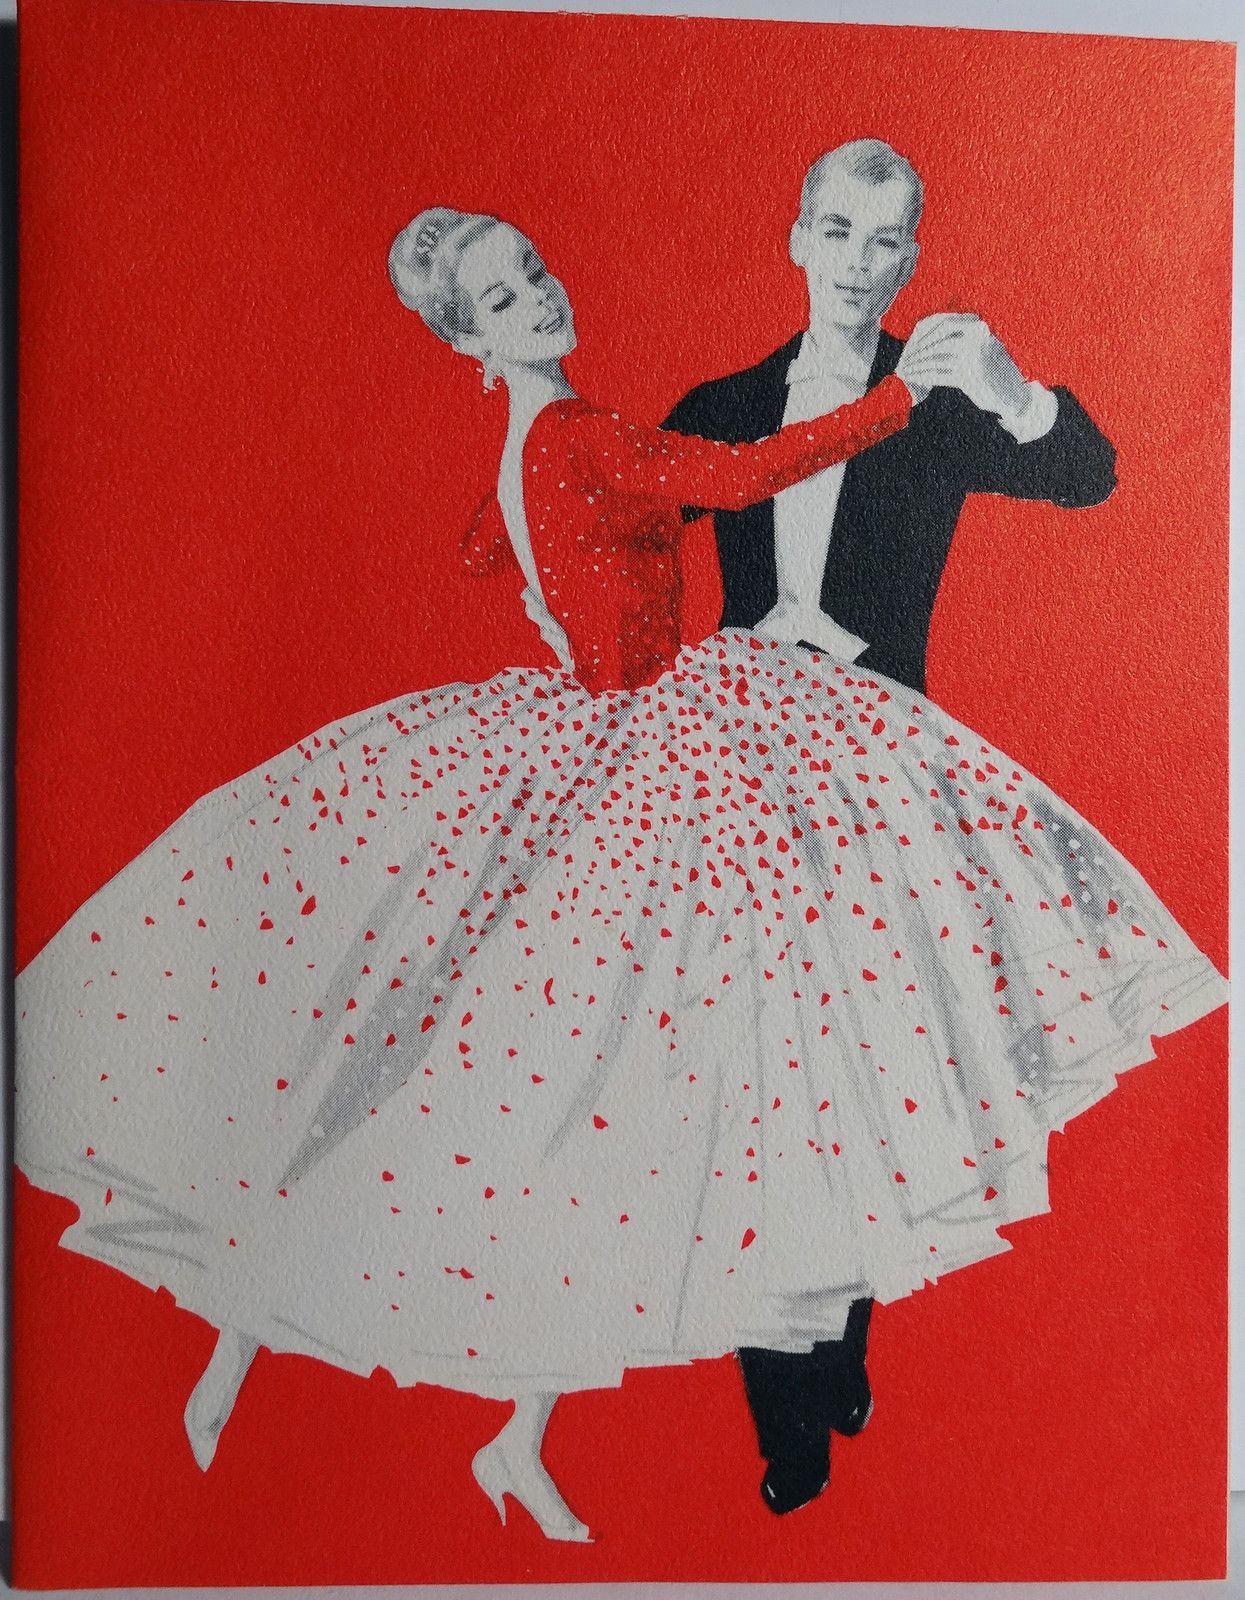 So cute - a vintage Christmas card with ballroom dancers | Ballroom ...